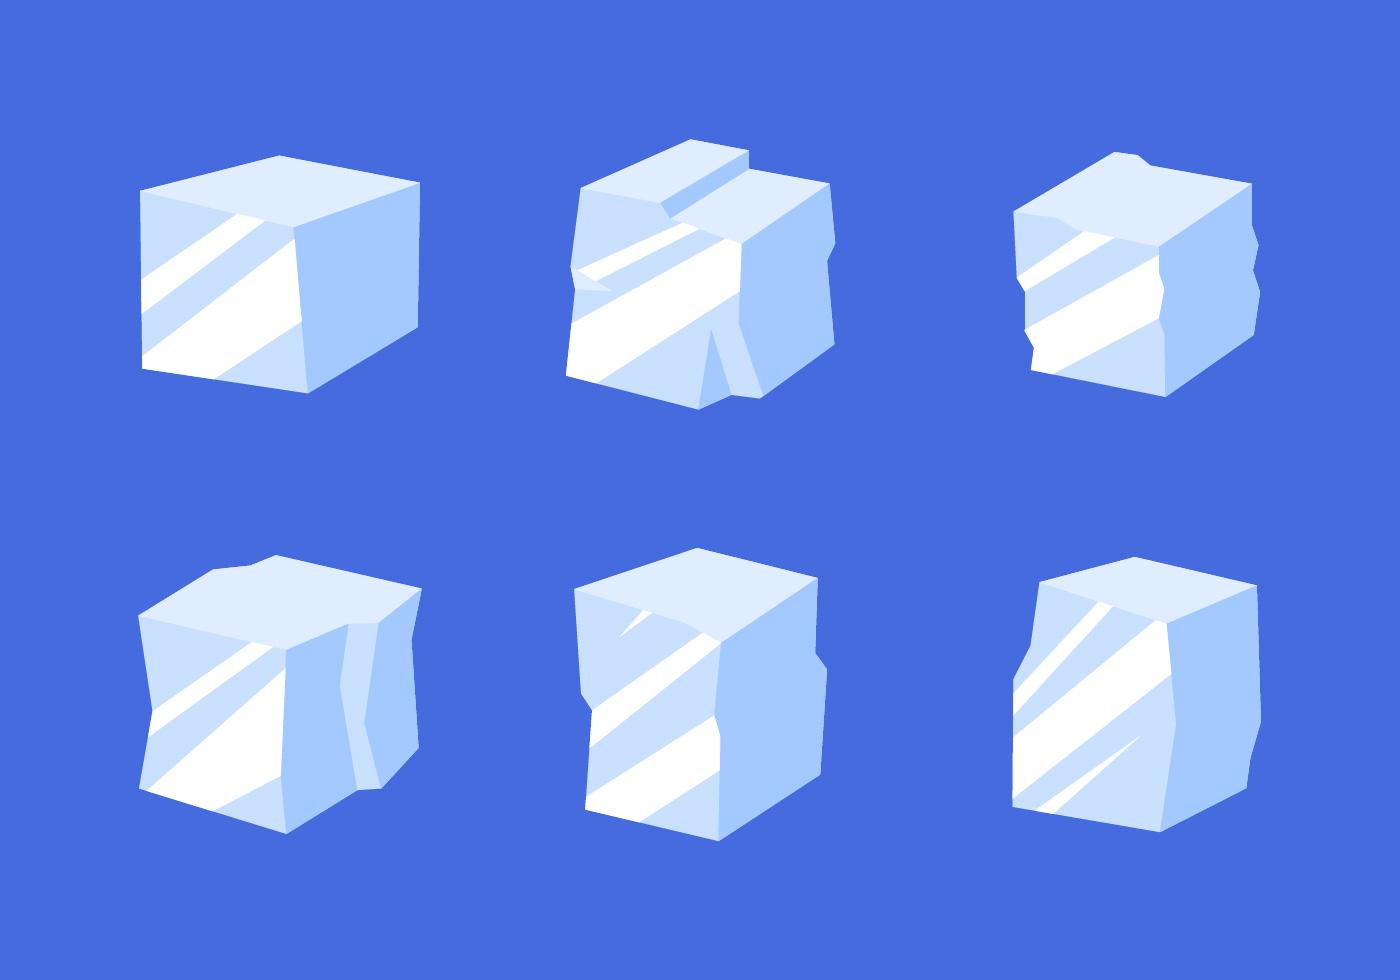 Unsolved Rubik'S Cube clipart. Free download transparent .PNG   Creazilla